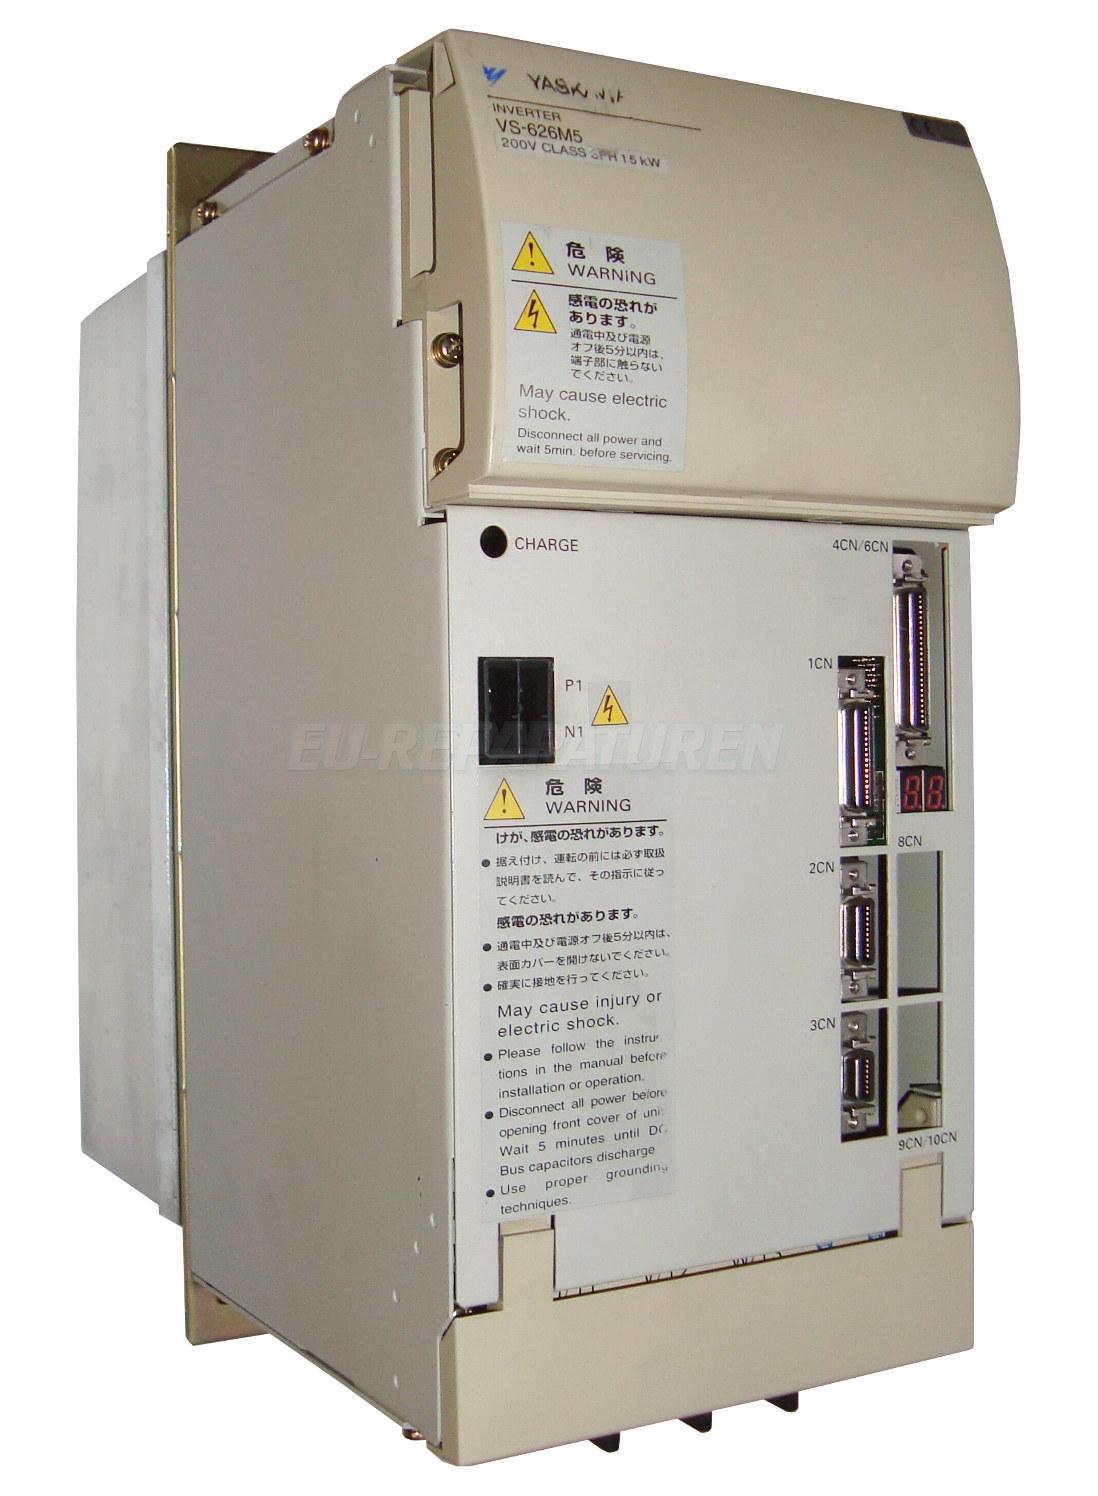 Reparatur Yaskawa CIMR-M5A20150-S0 AC DRIVE